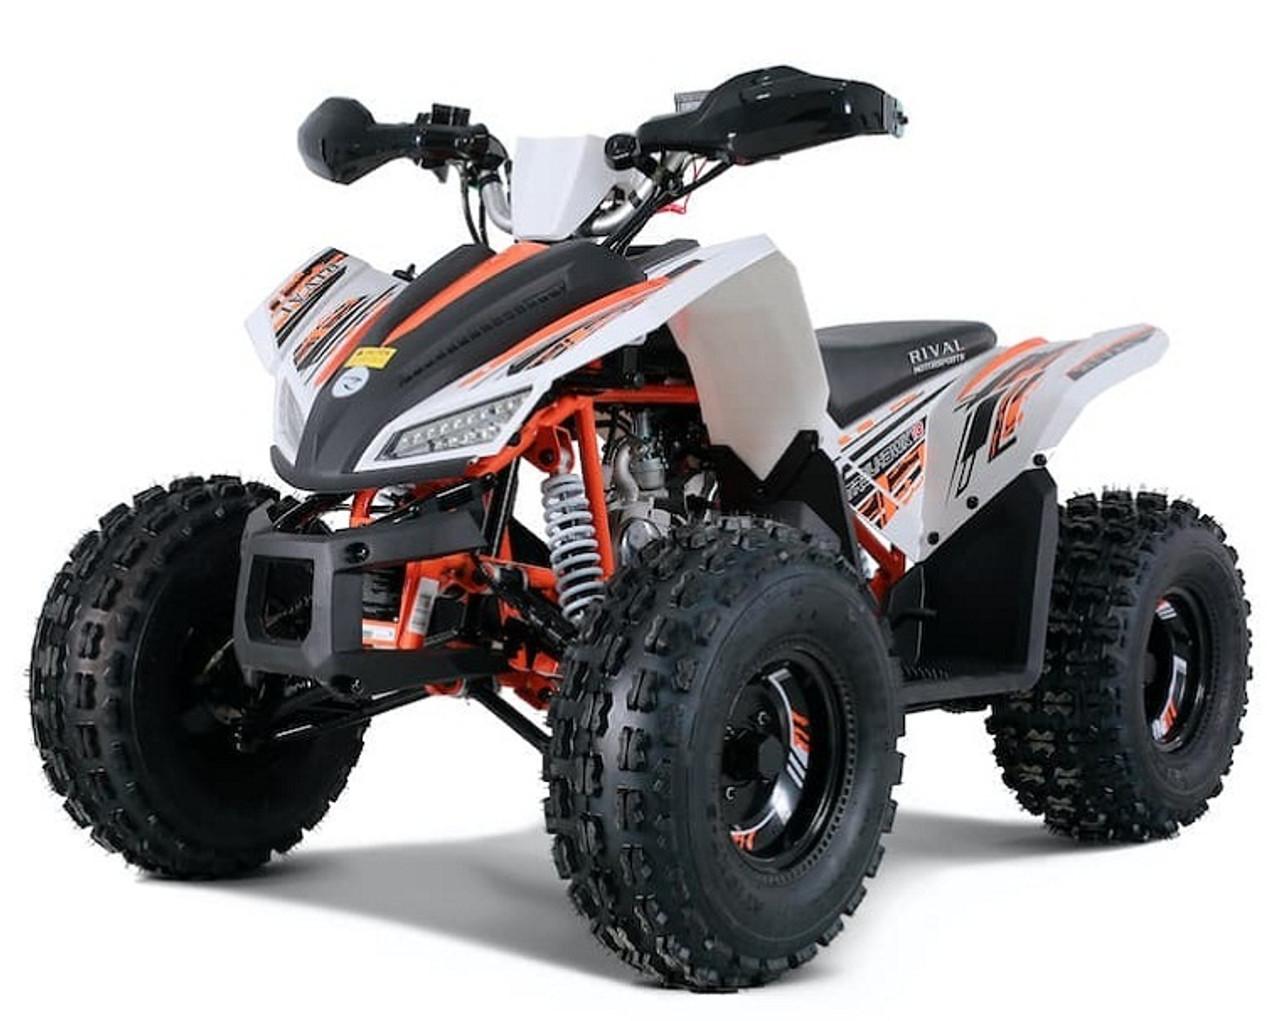 Rival Motor TRAILHAWK 10 ATV, 154FMI Automatic, Electric start